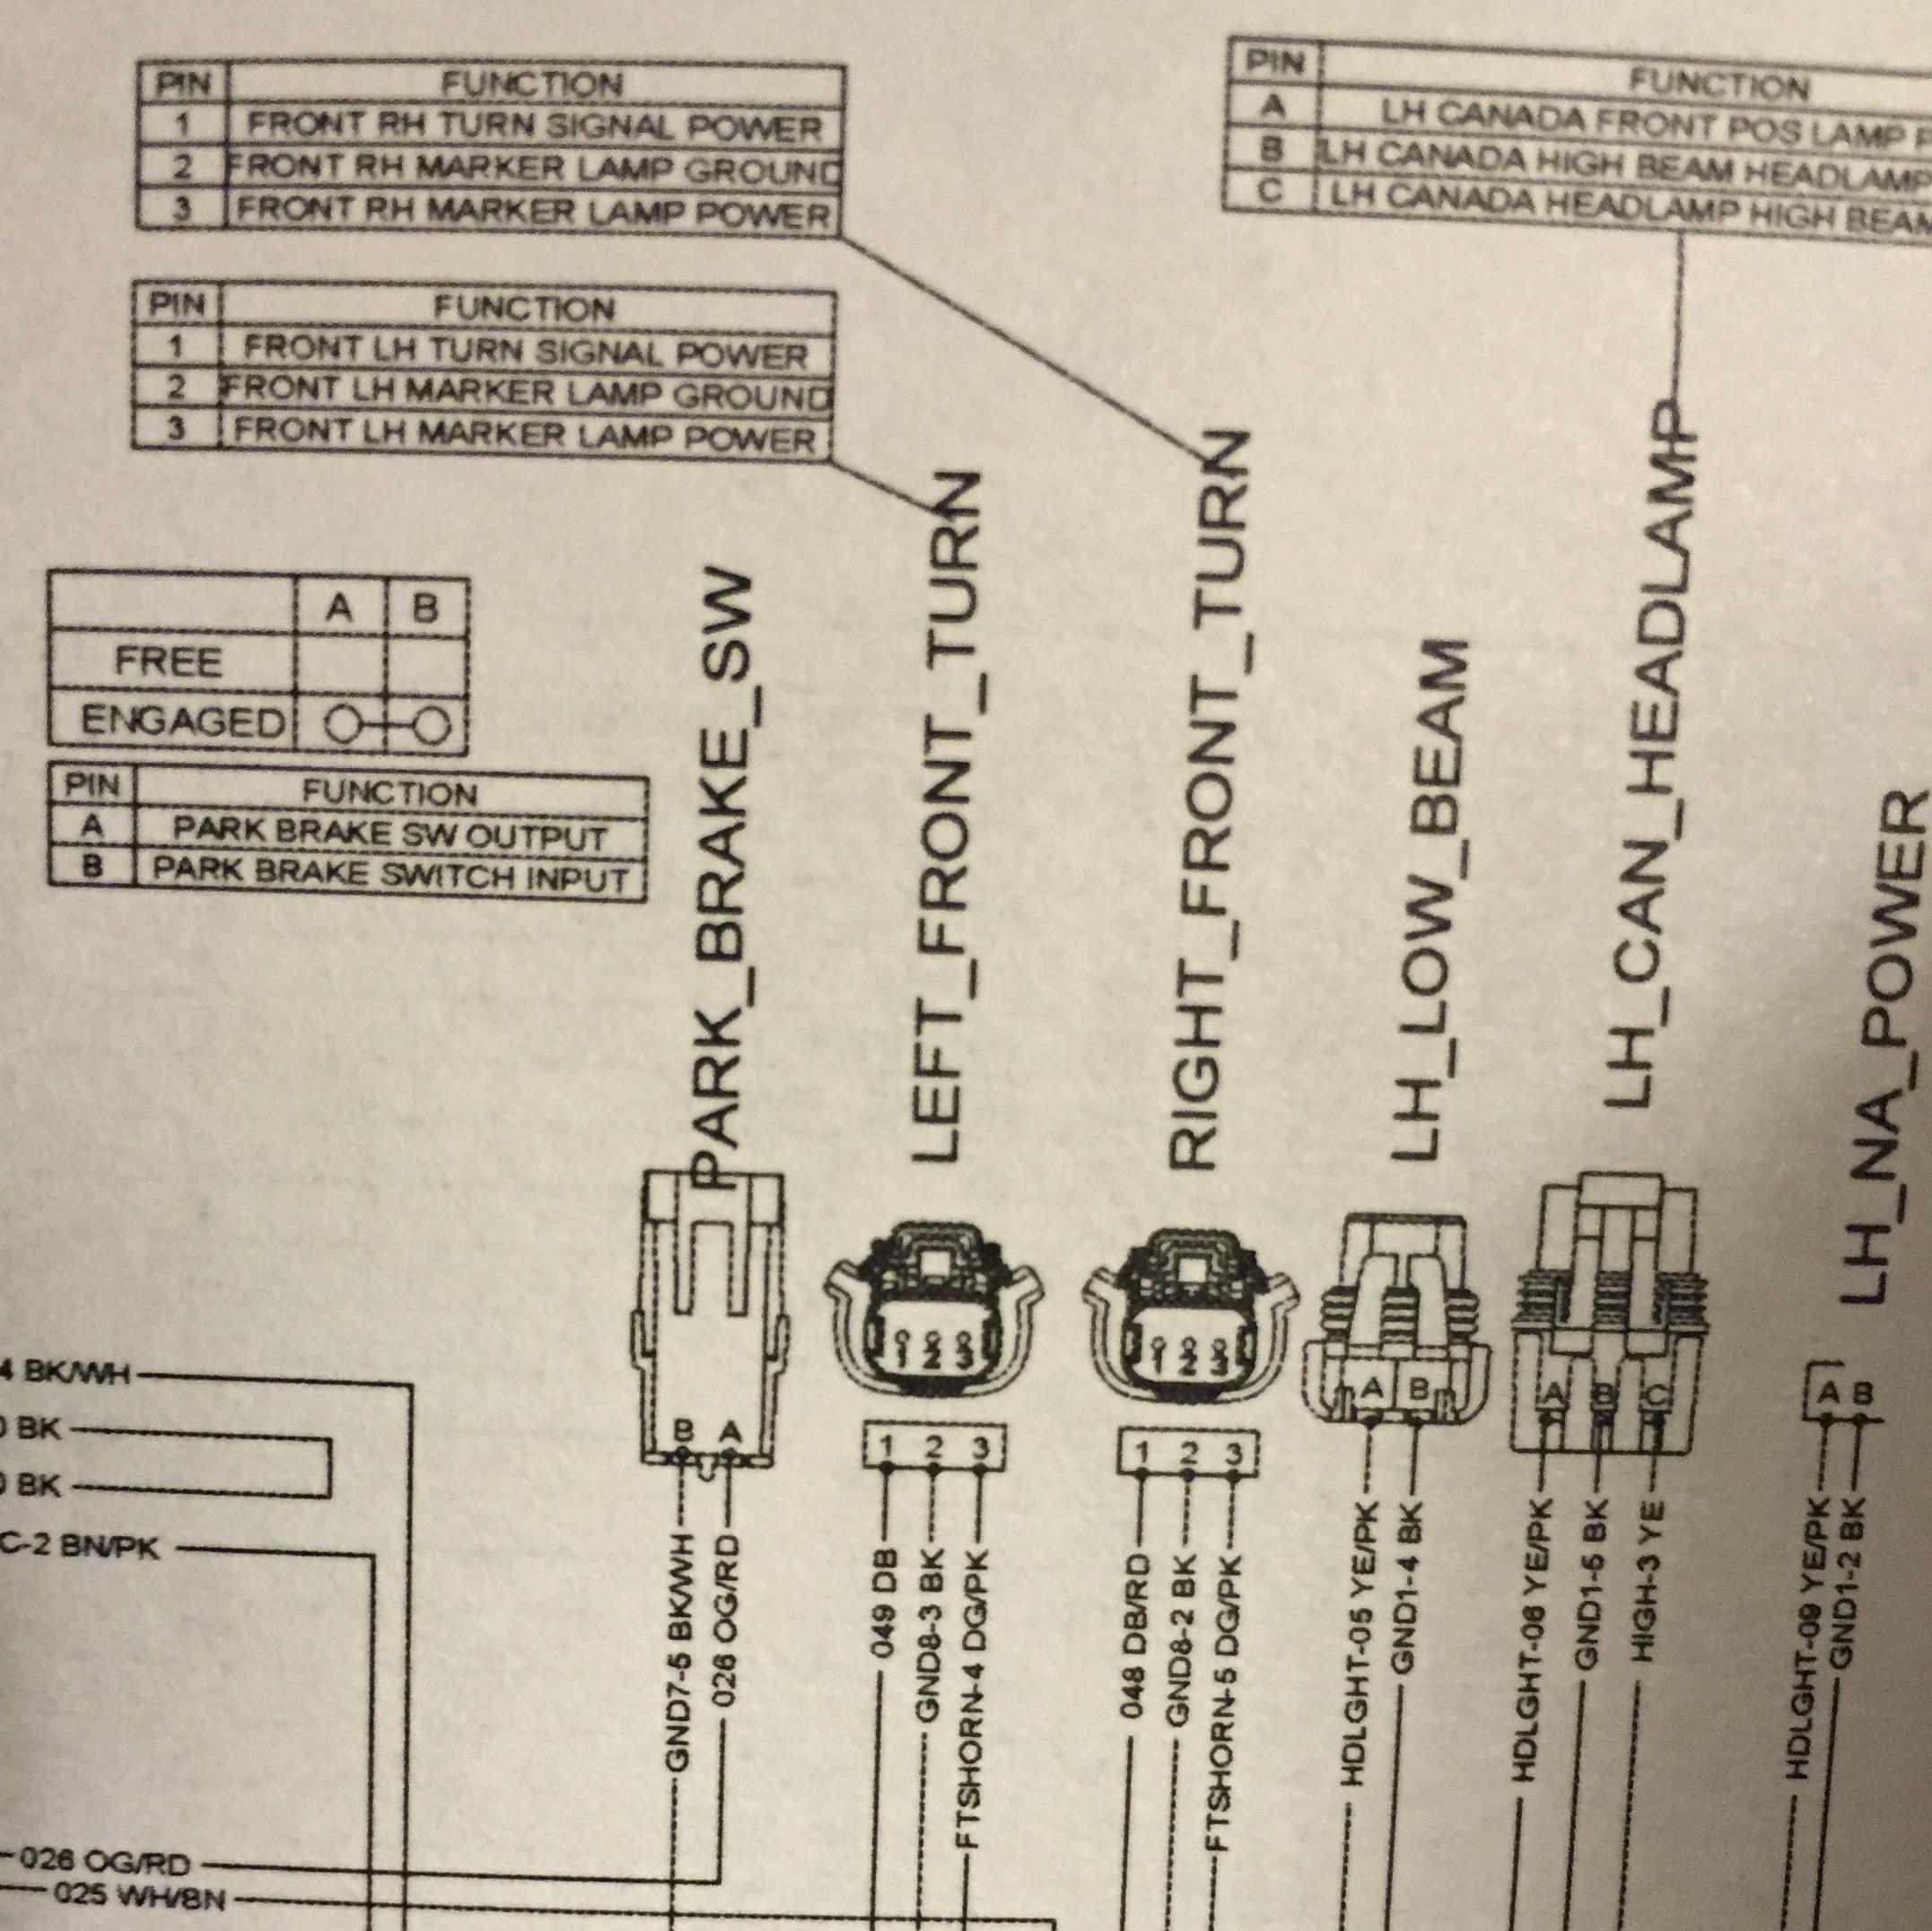 Turn Signal Wire Help Please Polaris Slingshot Forum Thread Wiring Helpplease Imagejpeg